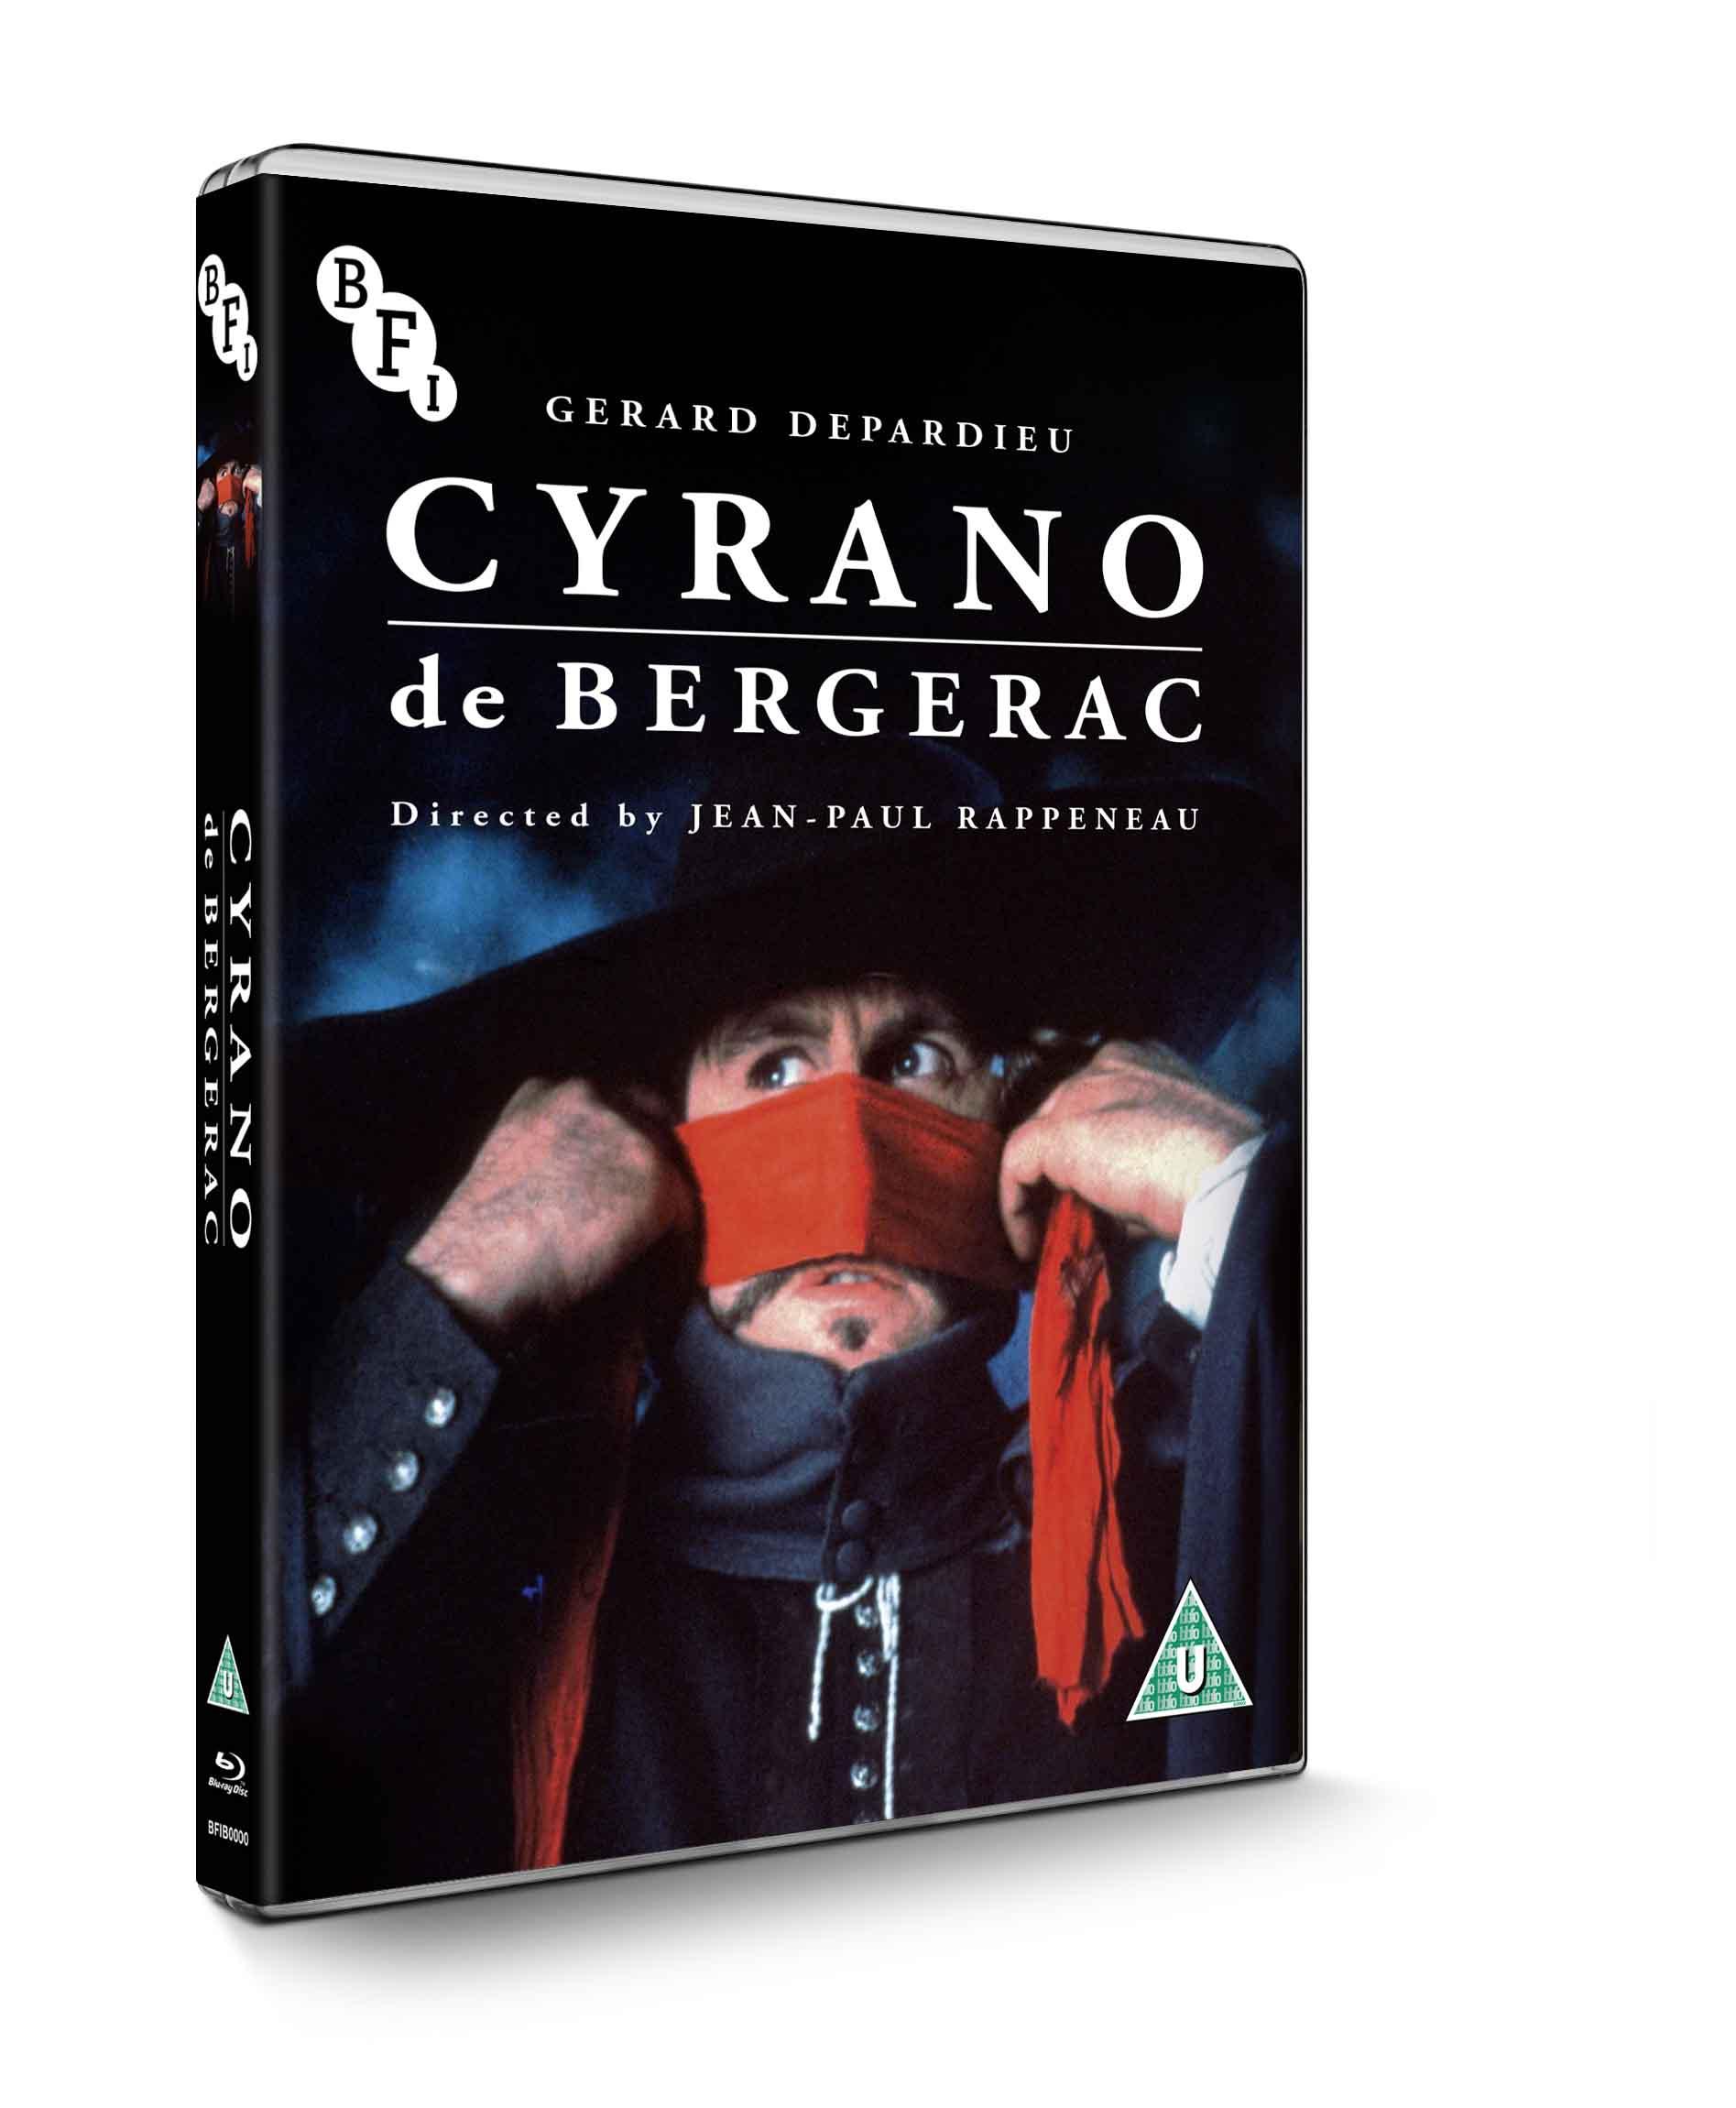 Buy Cyrano de Bergerac (Blu-ray)